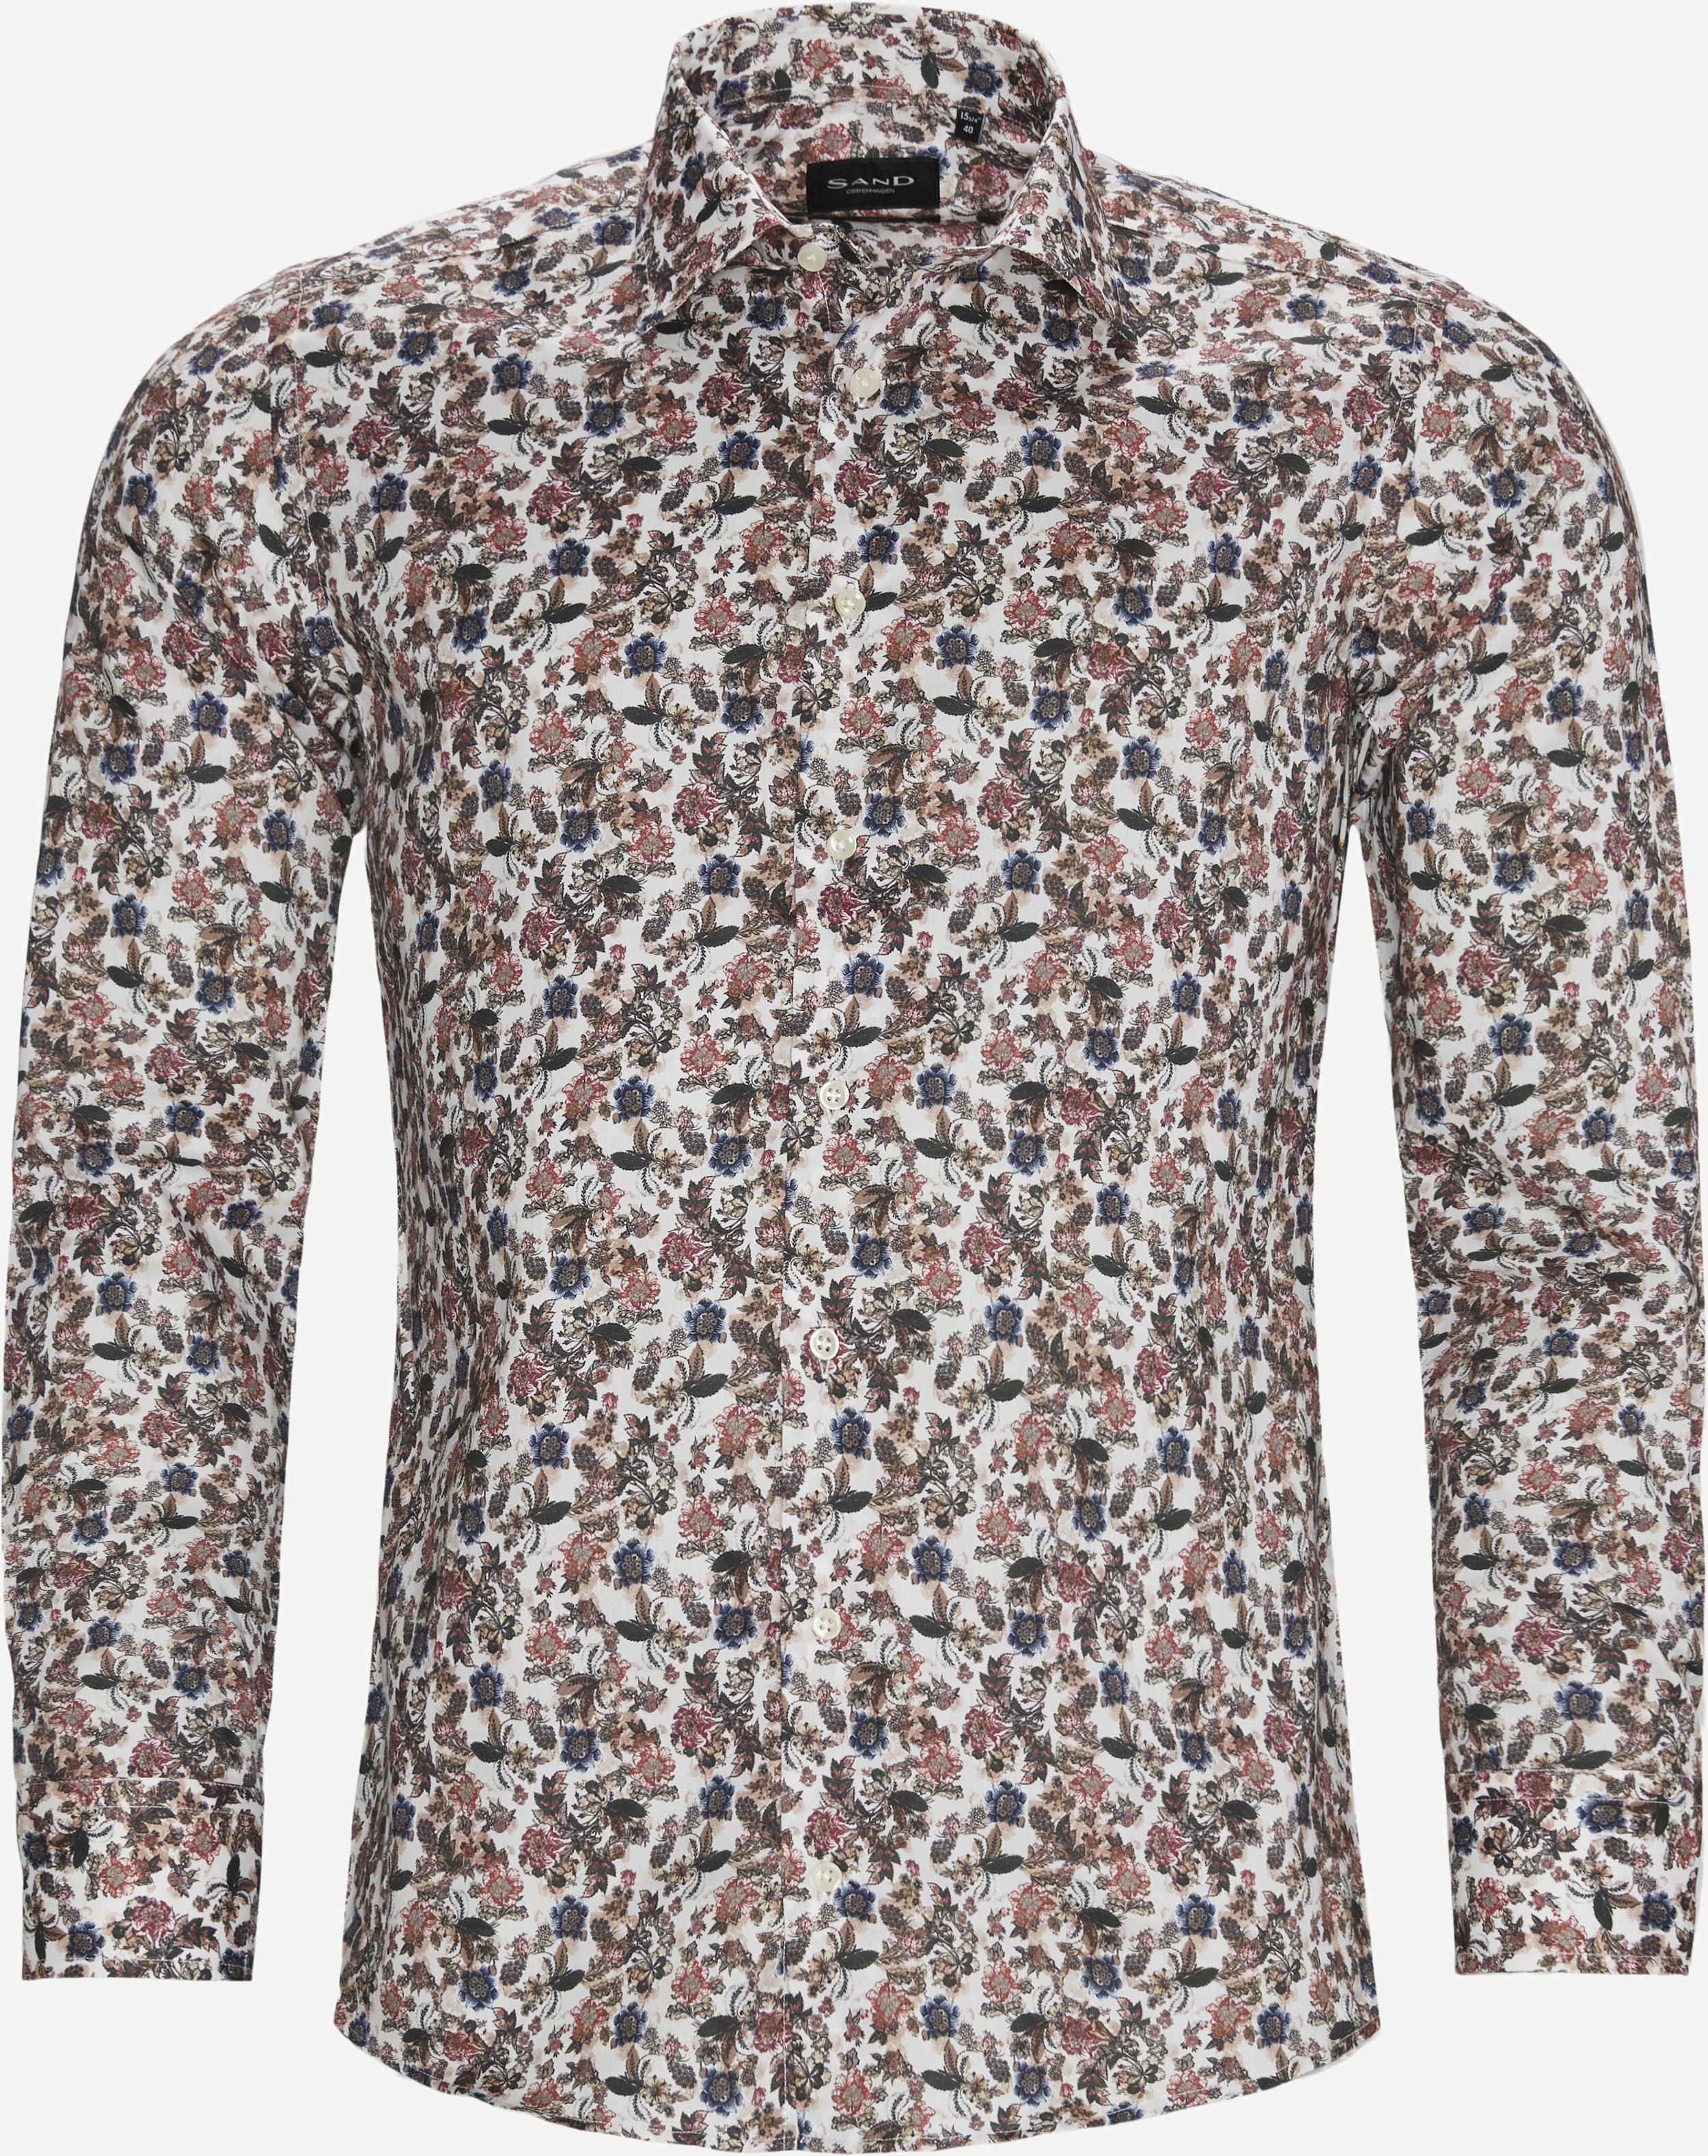 8763 Iver2/State Shirt - Skjorter - Brun